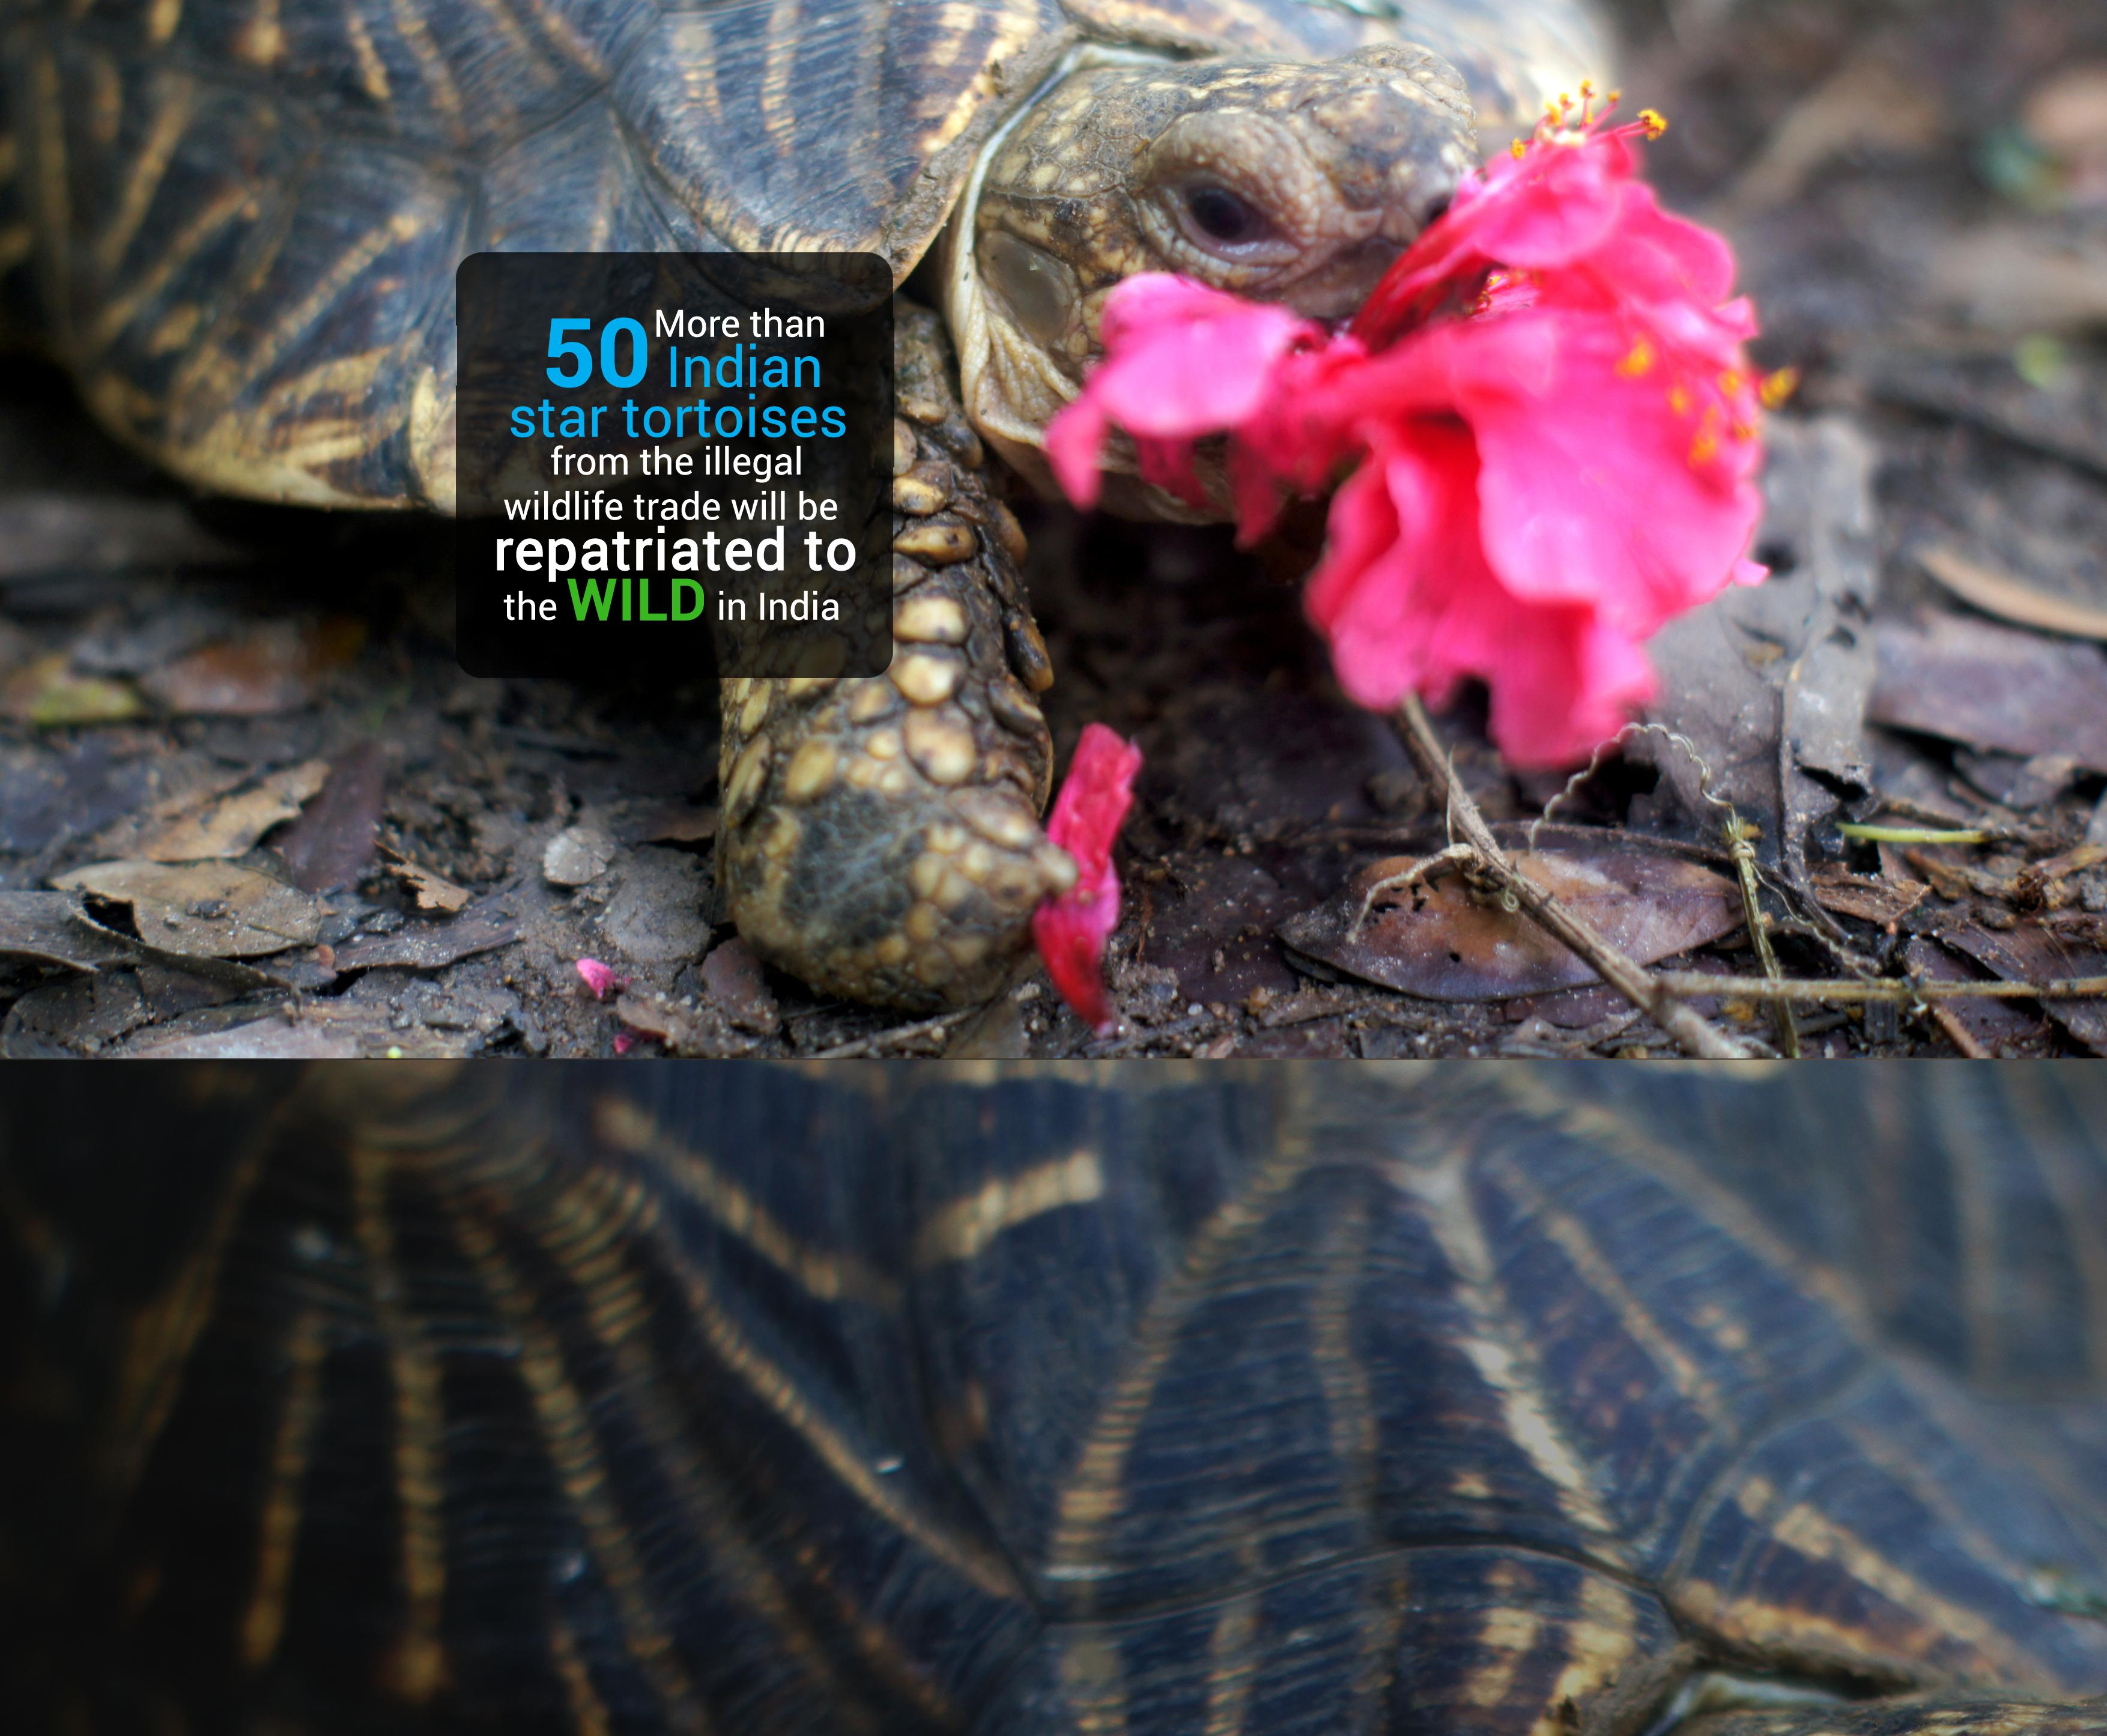 Star Tortoise Repatriation